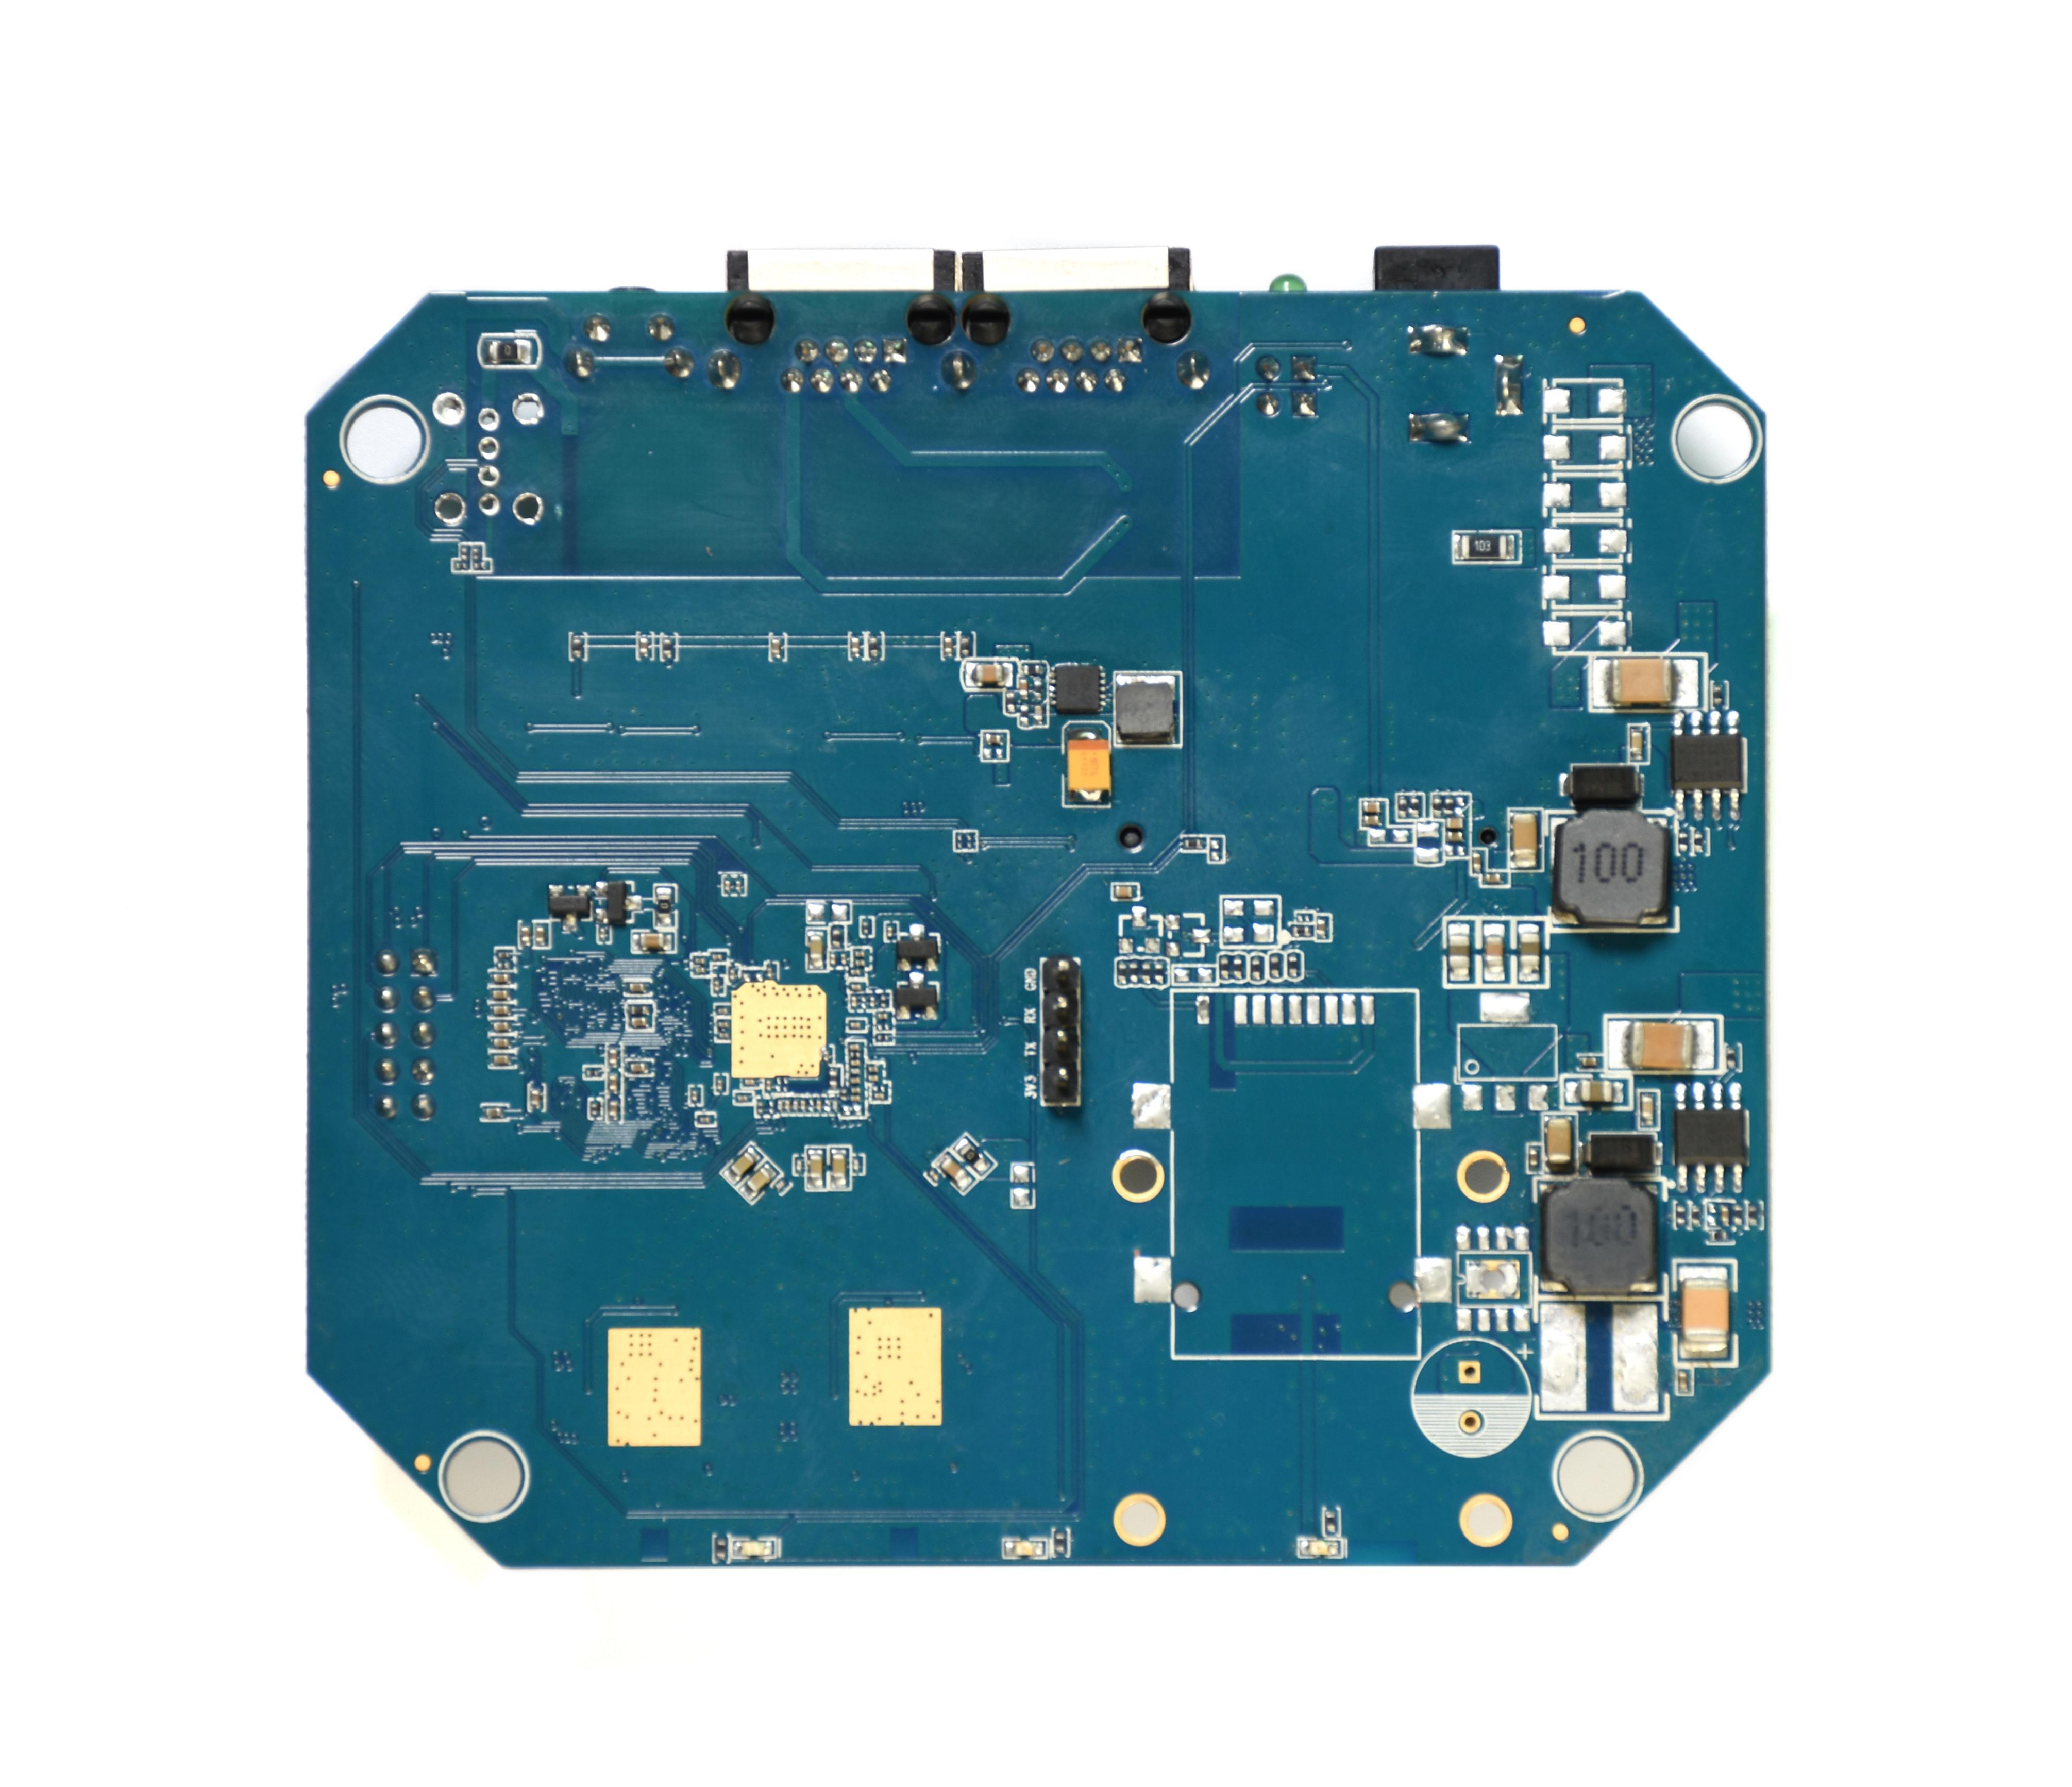 Qca9531 Qca9880 Ar8035 High Power 300m Openwrt Poe Celling